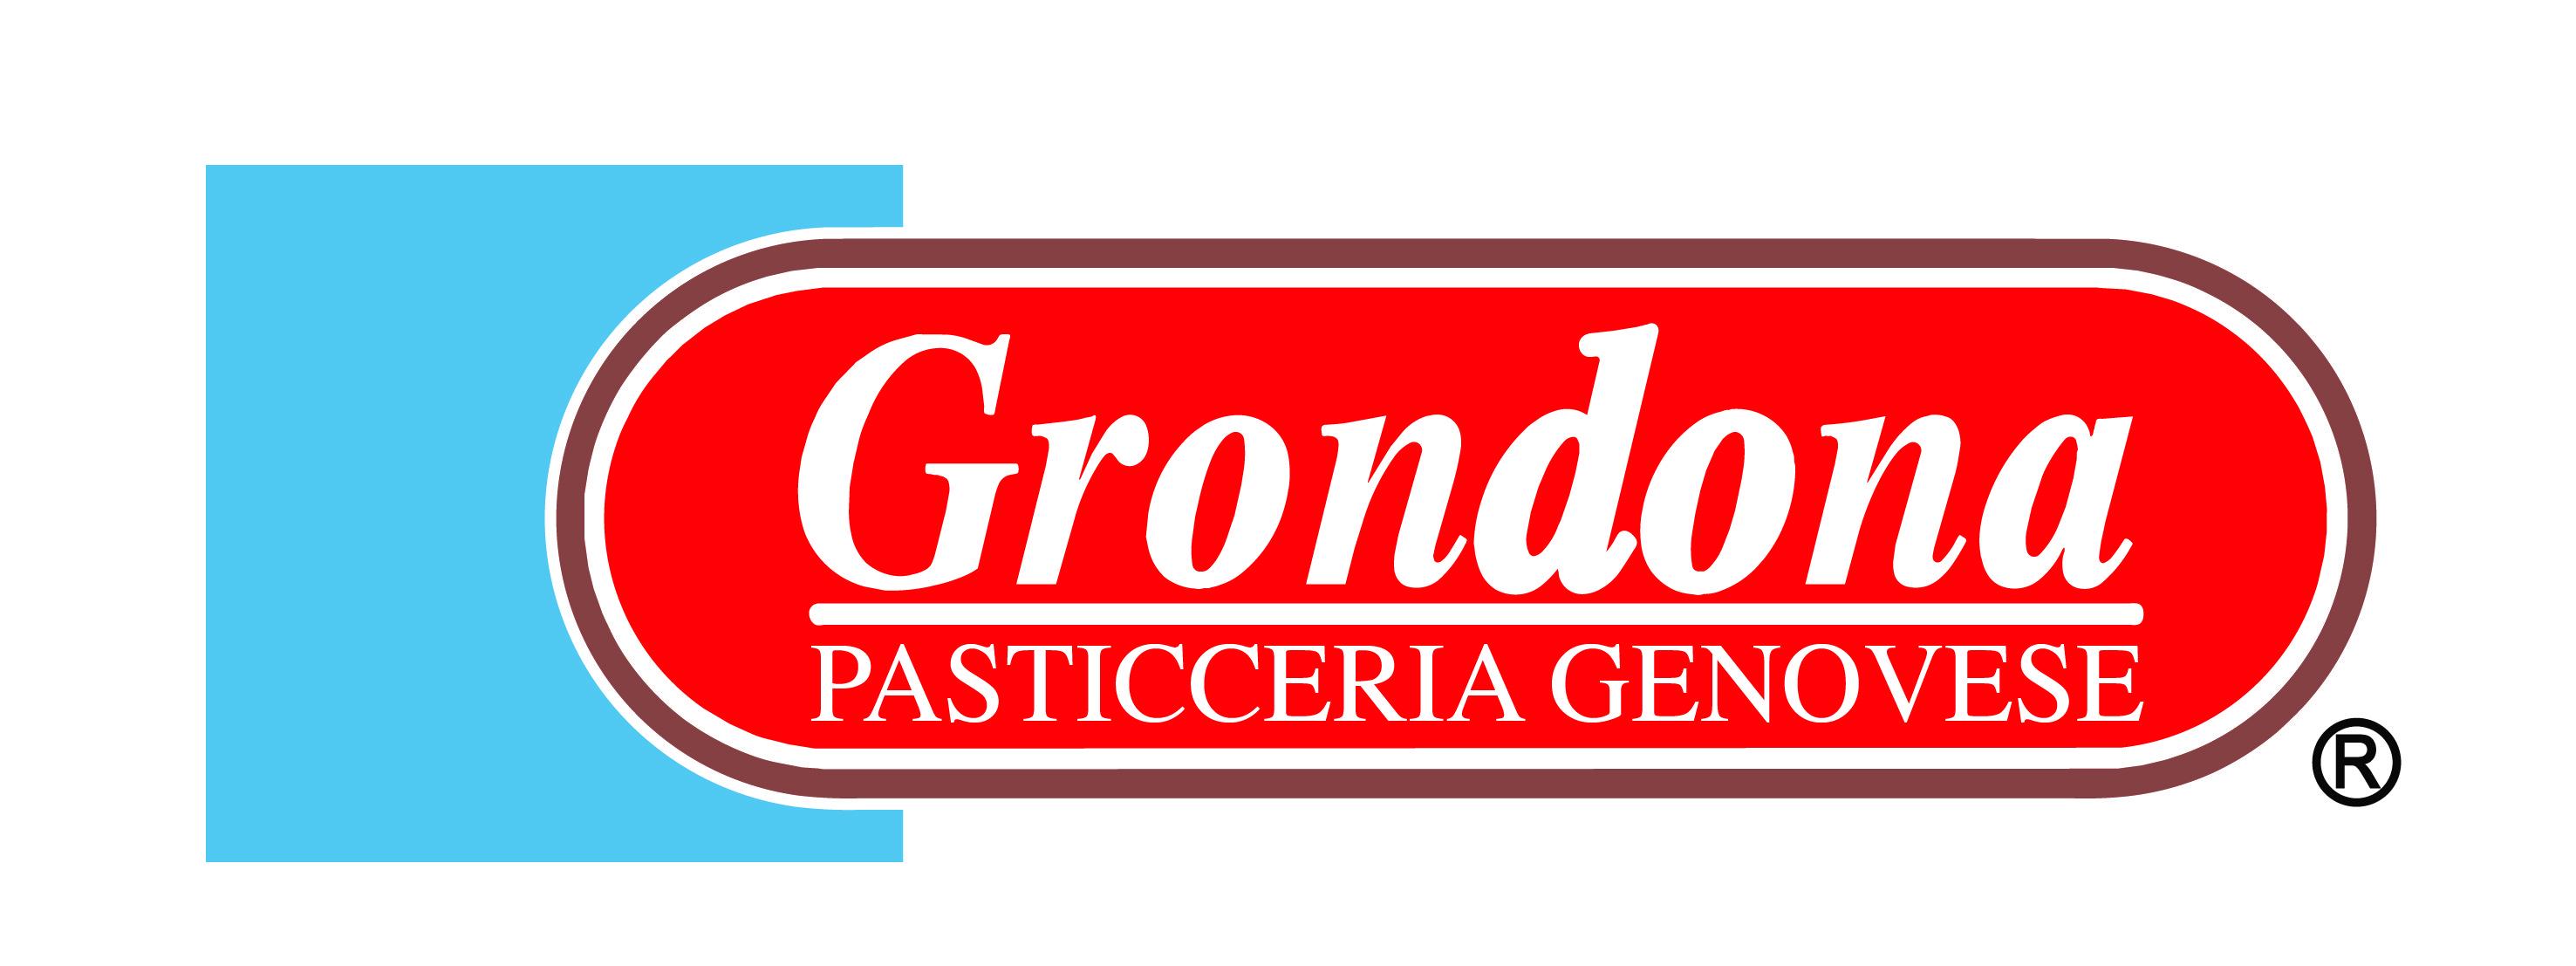 LOGO GRONDONA